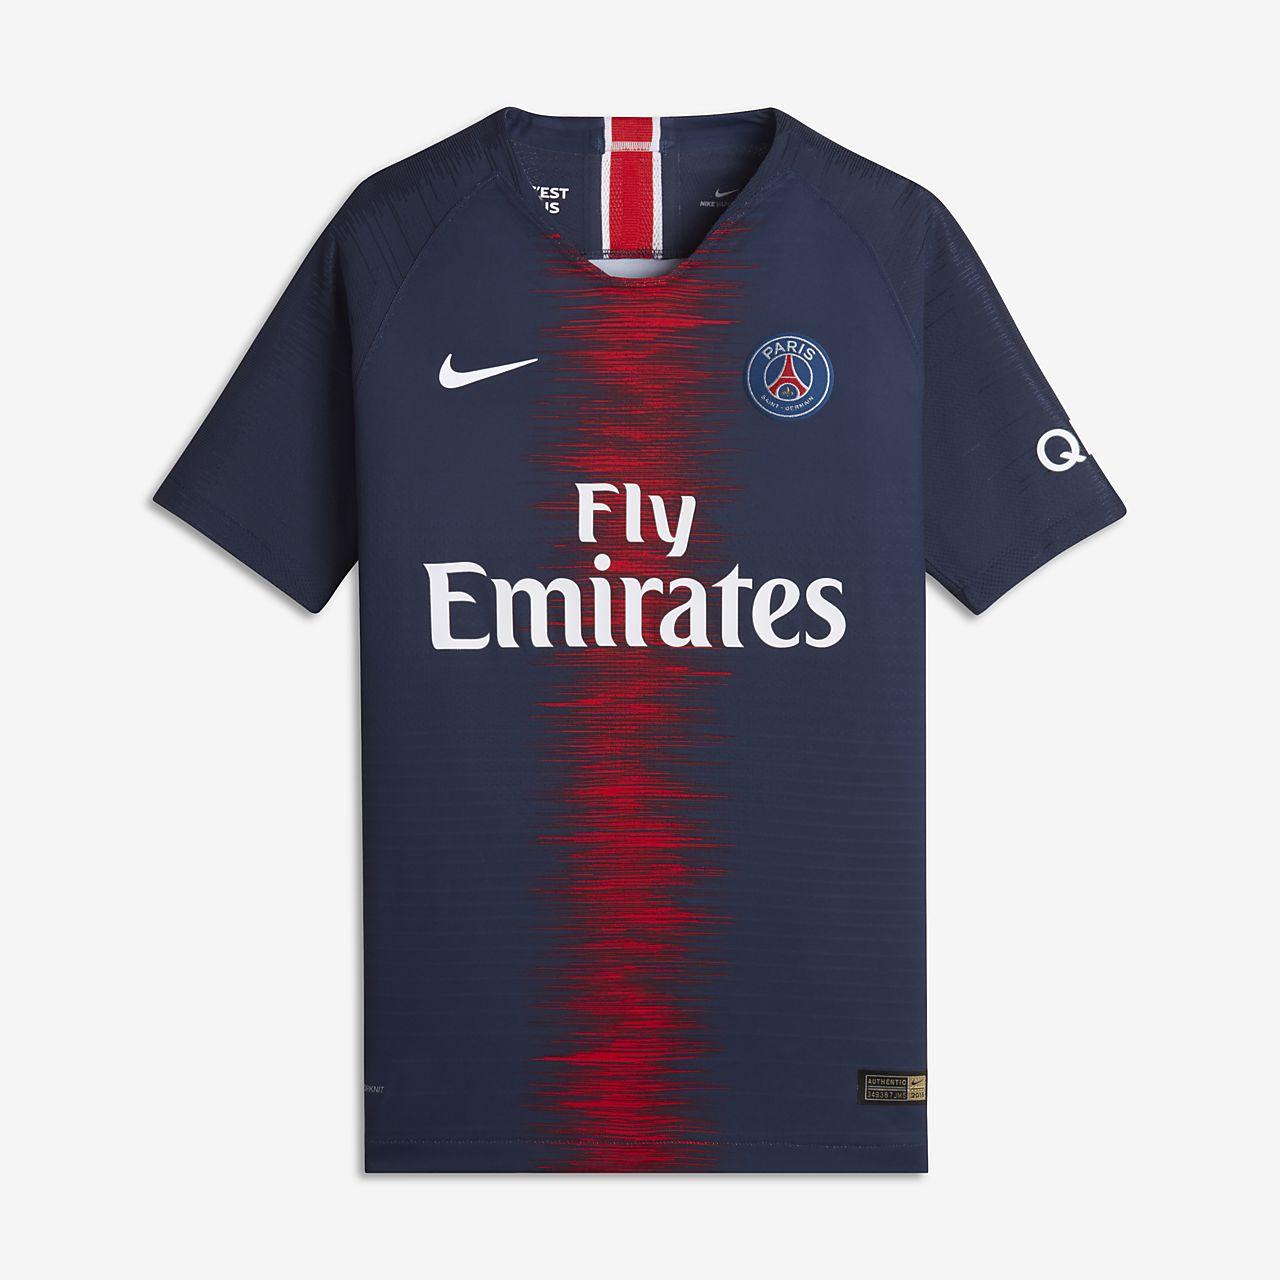 2018/19 Paris Saint-Germain Vapor Match Home Fußballtrikot für ältere Kinder